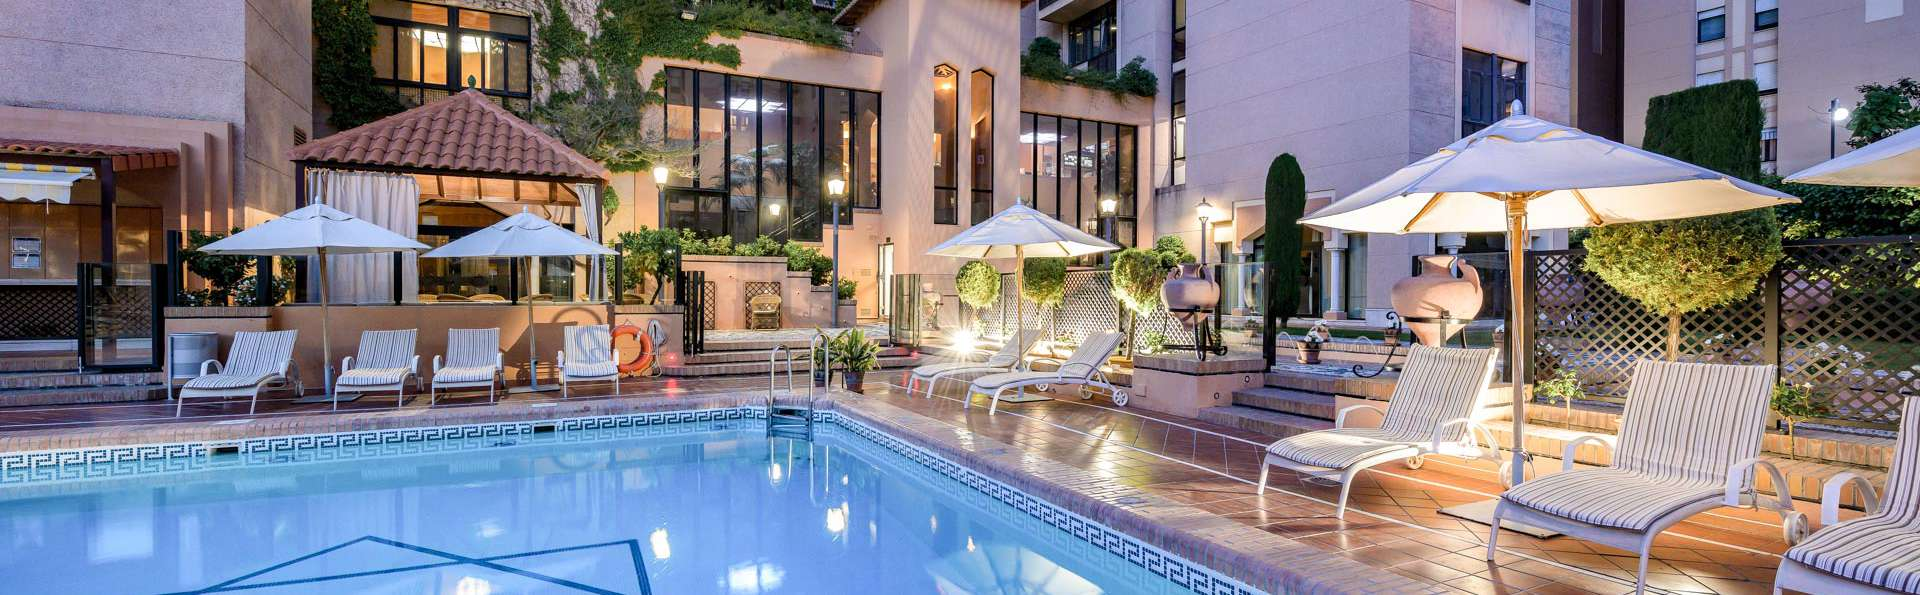 Hotel Saray - EDIT_N2_POOL_04.jpg